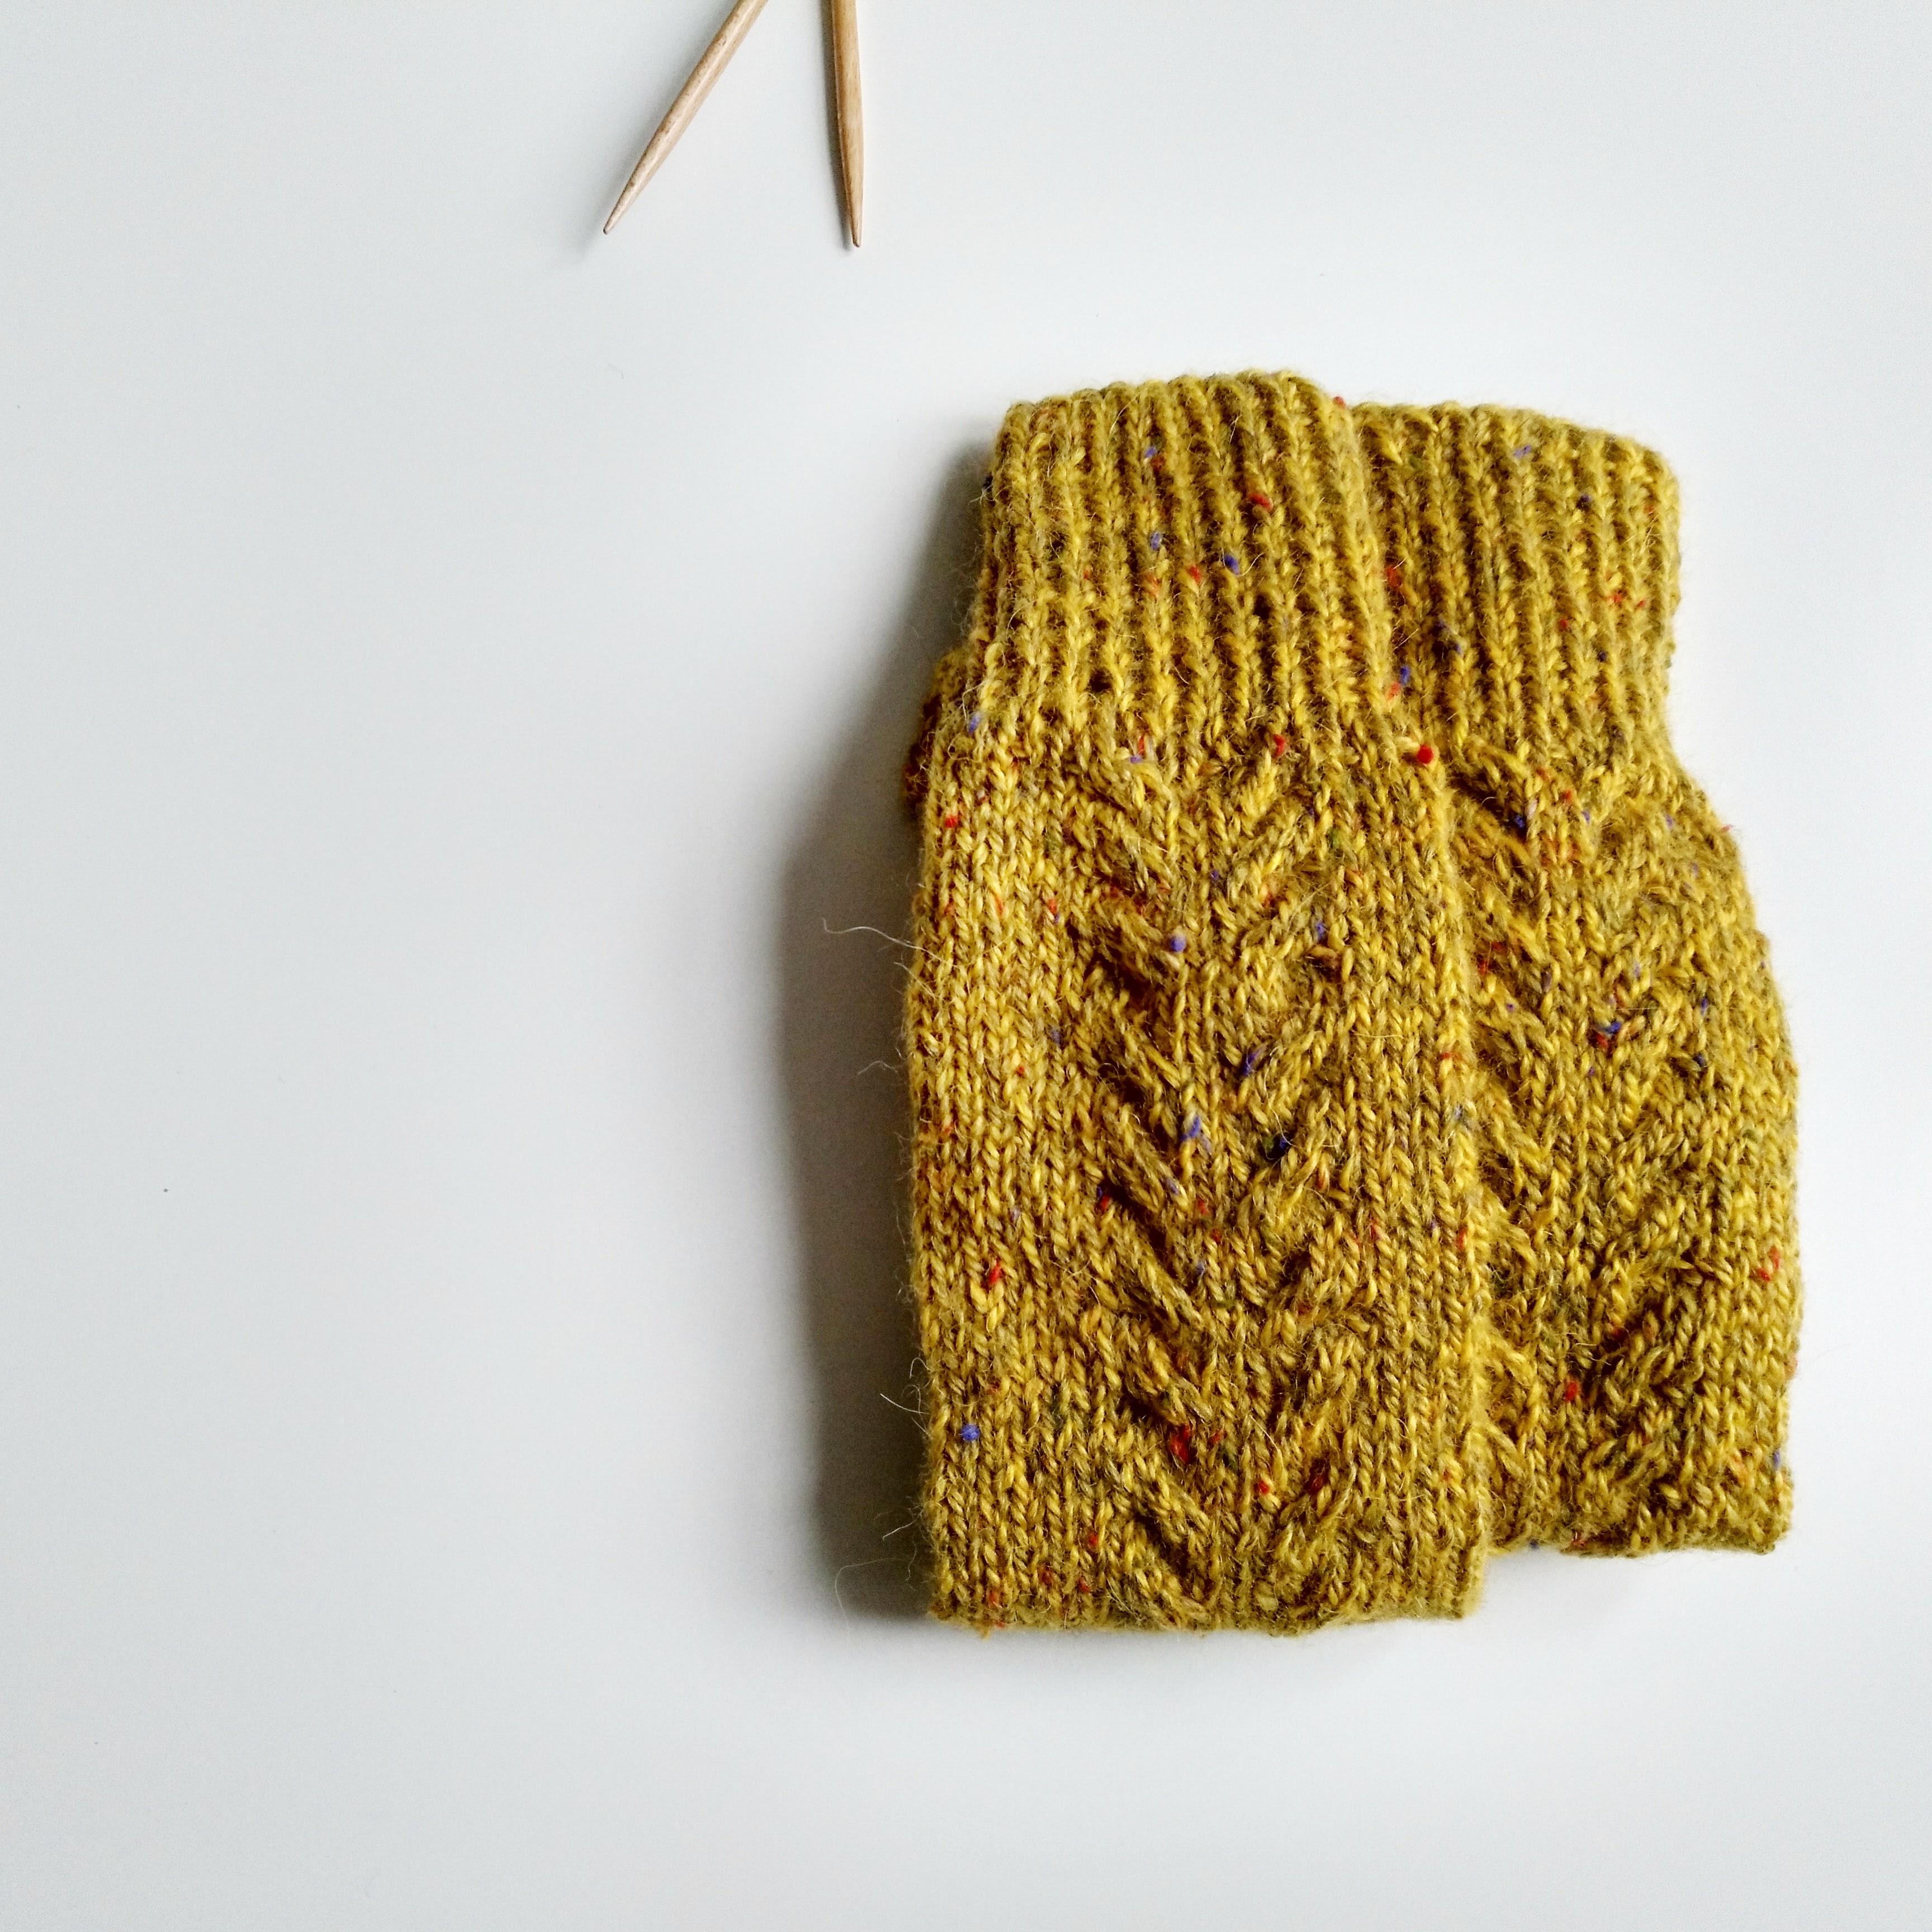 Calcetines Autumn Goals tejiedos a mano con lana randonnees